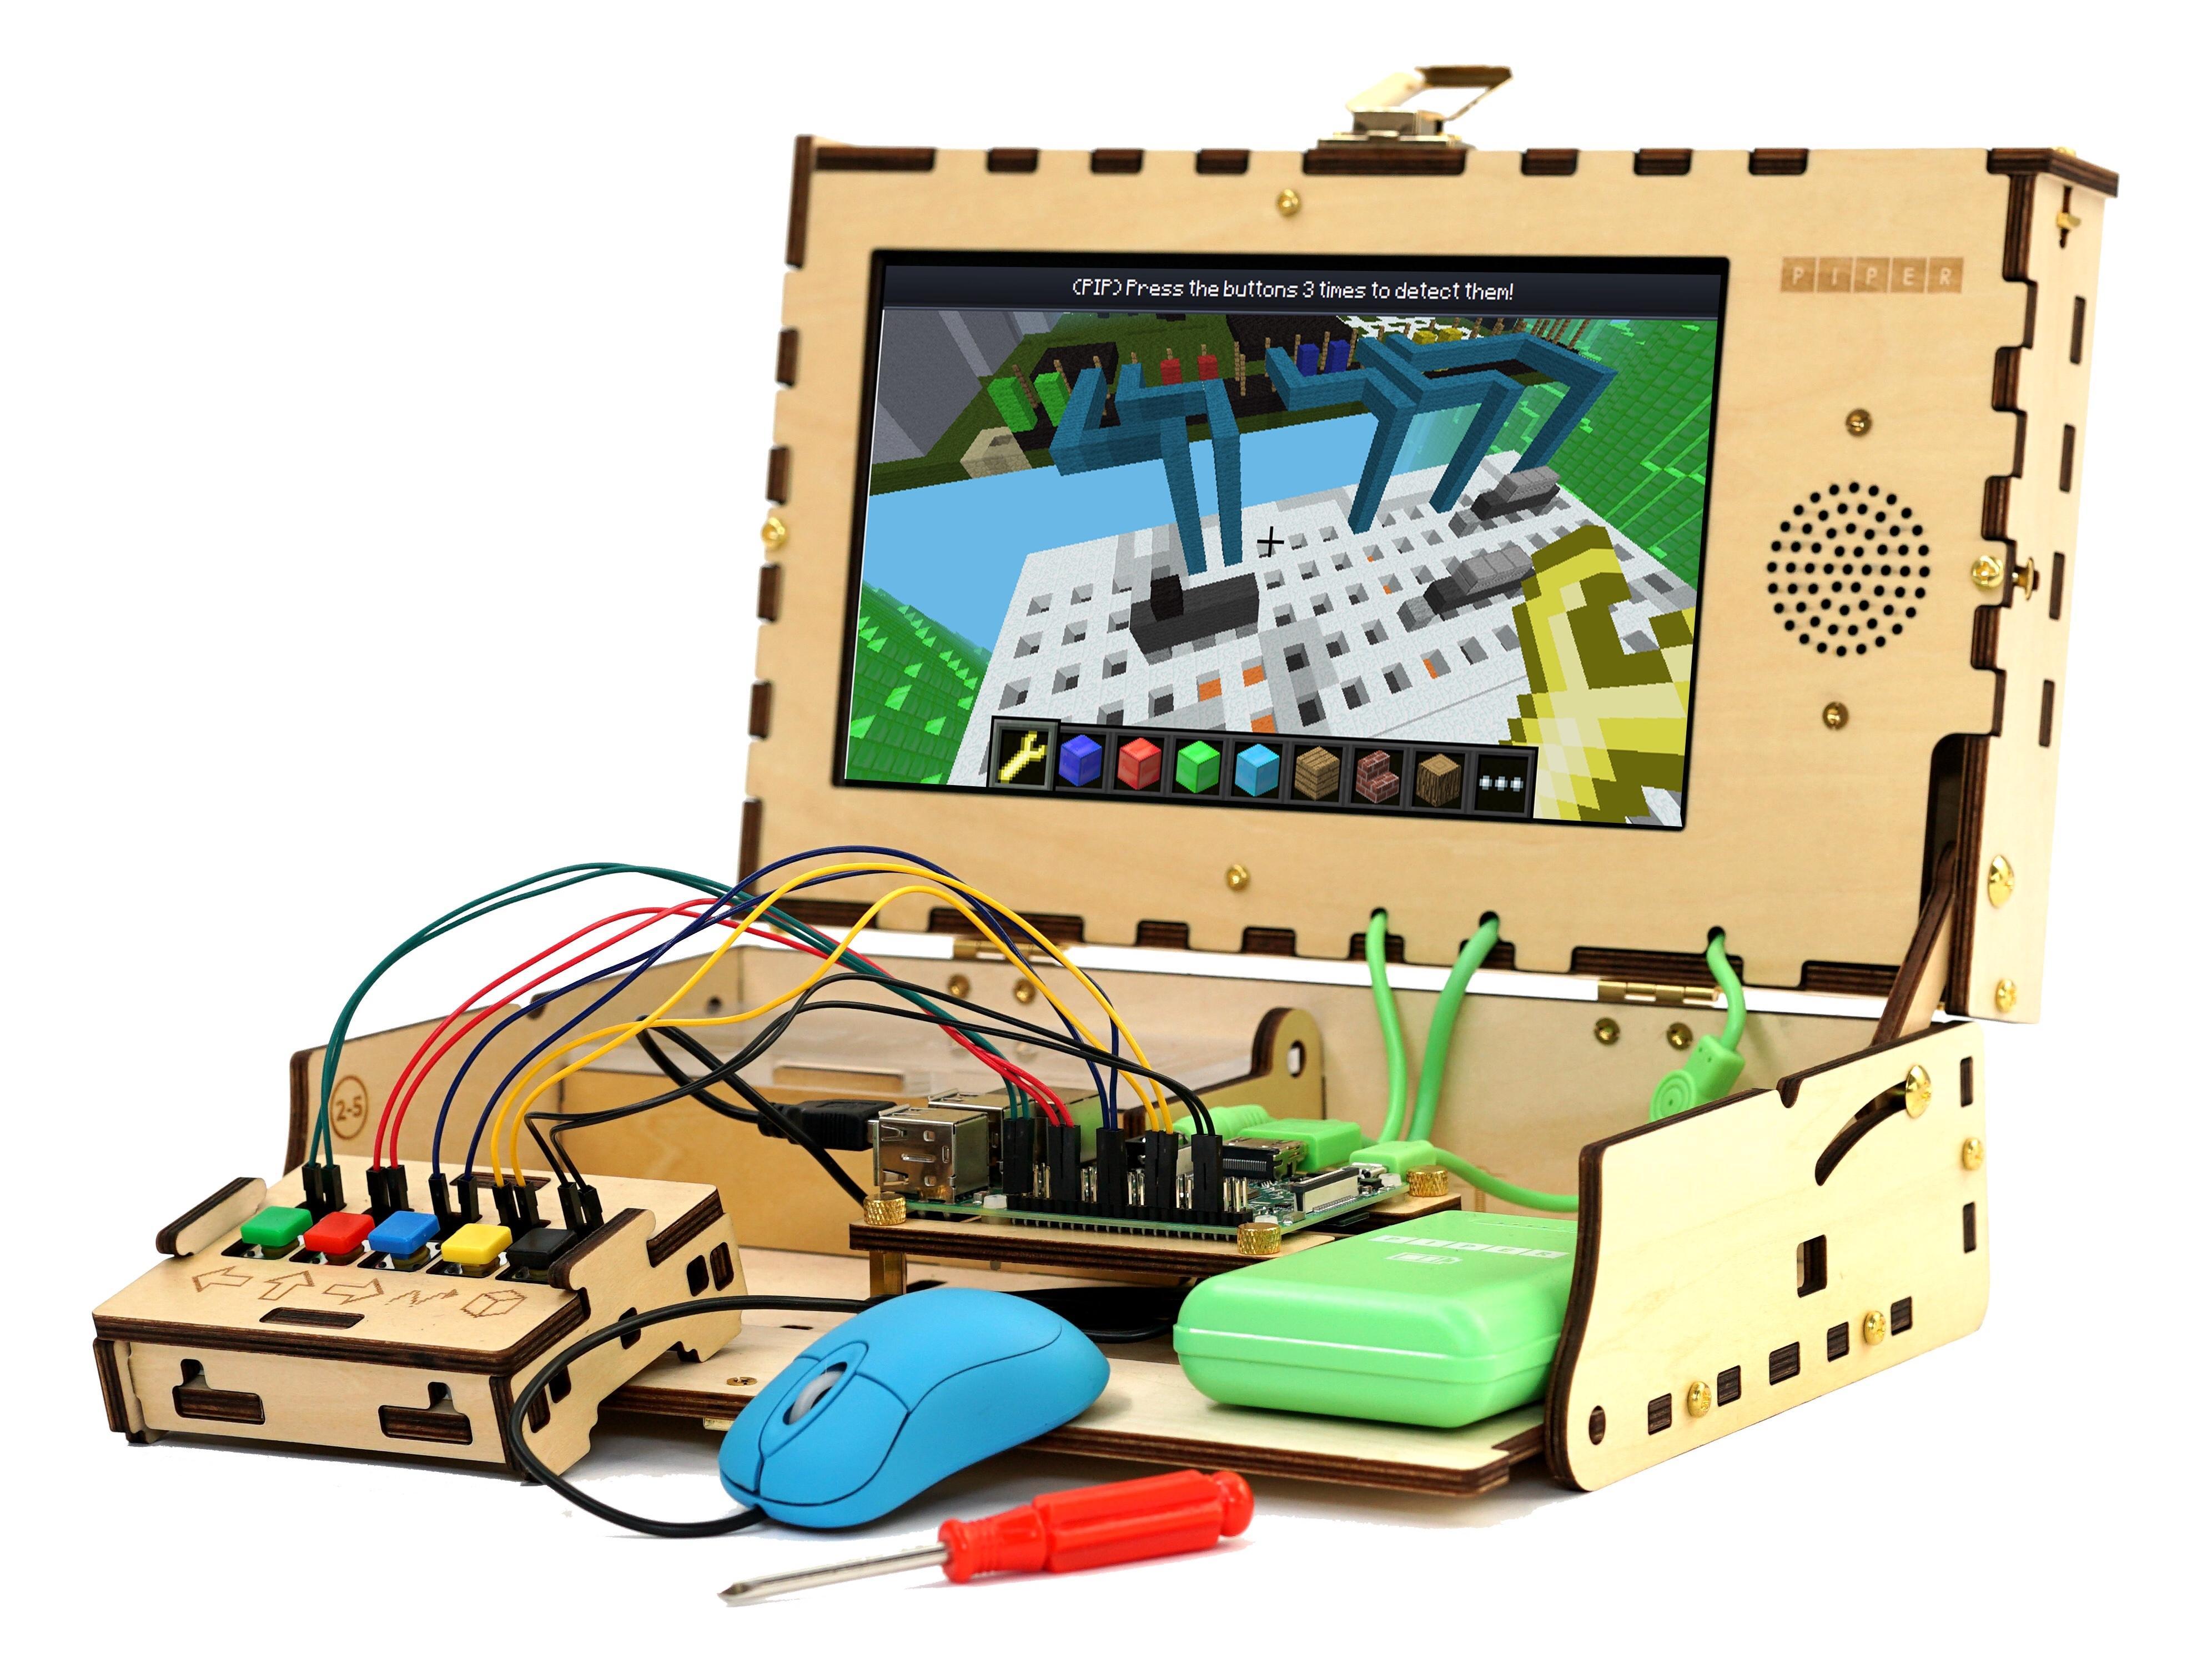 piper-computer.jpg